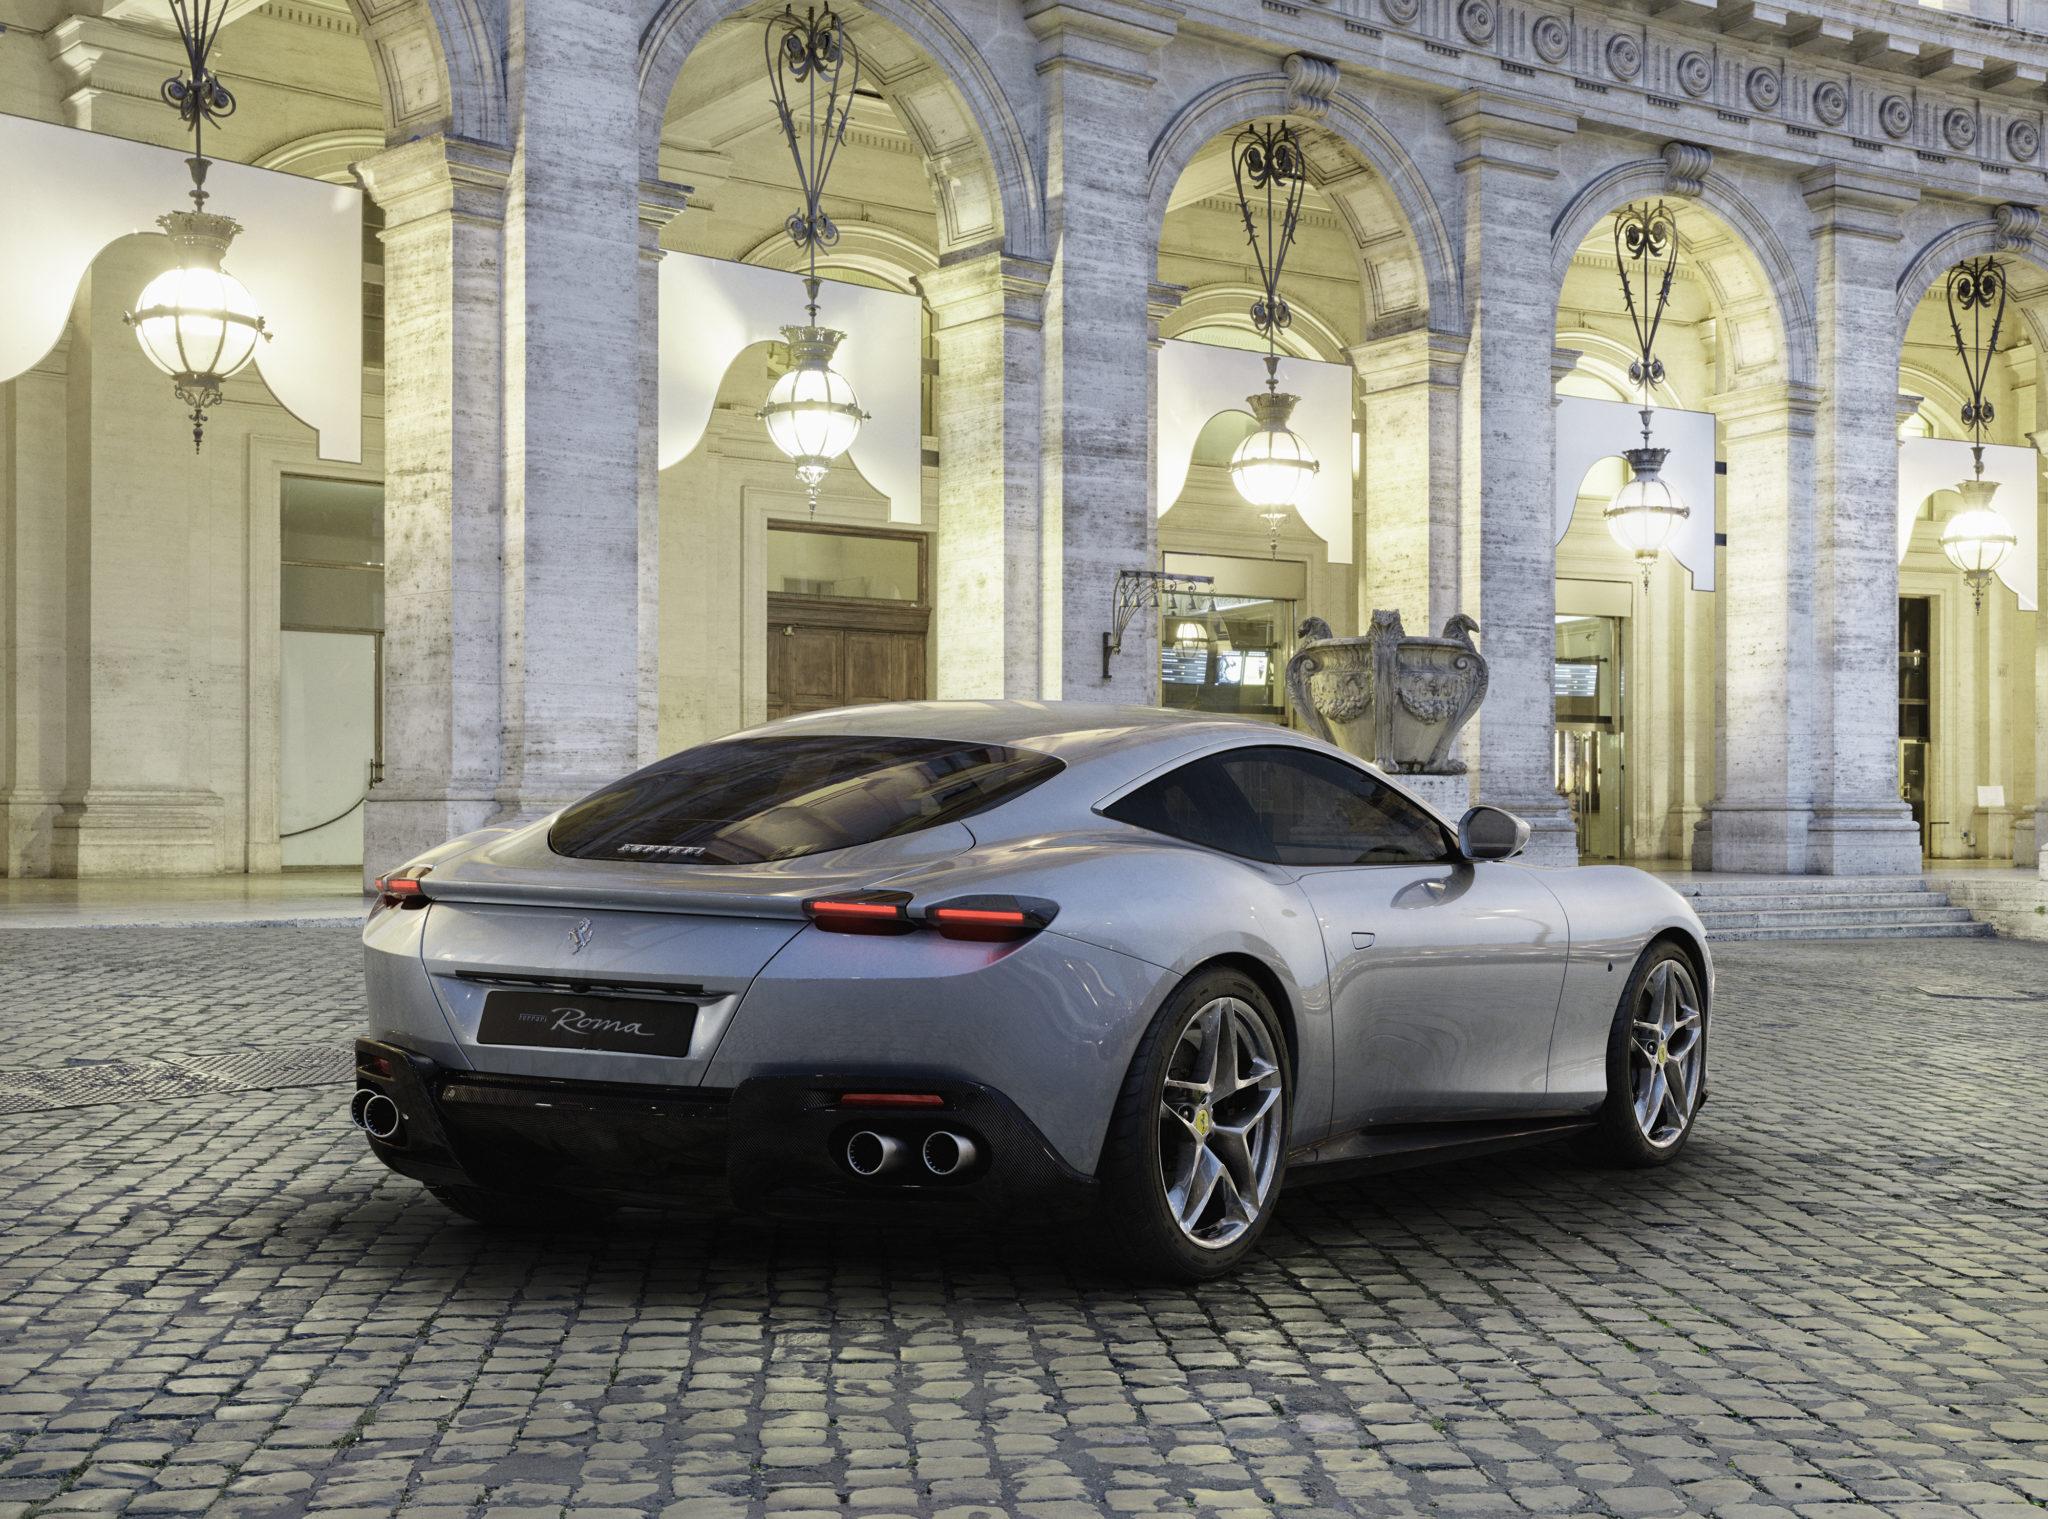 Ferrari Re-starting Production